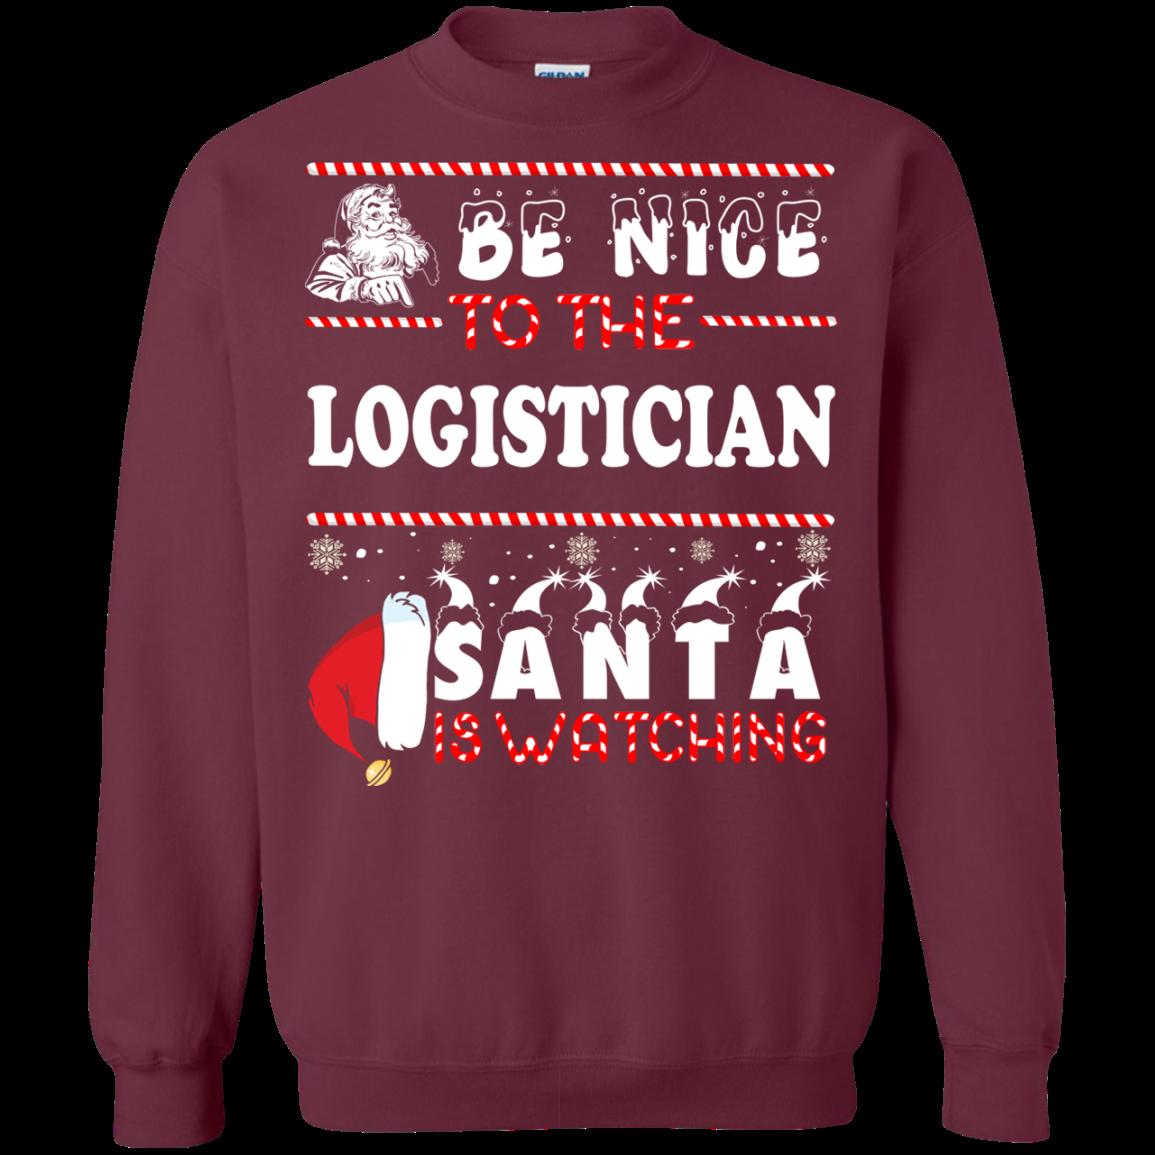 Be Nice To The Logistician Santa Is Watching Sweatshirt, T Shirt